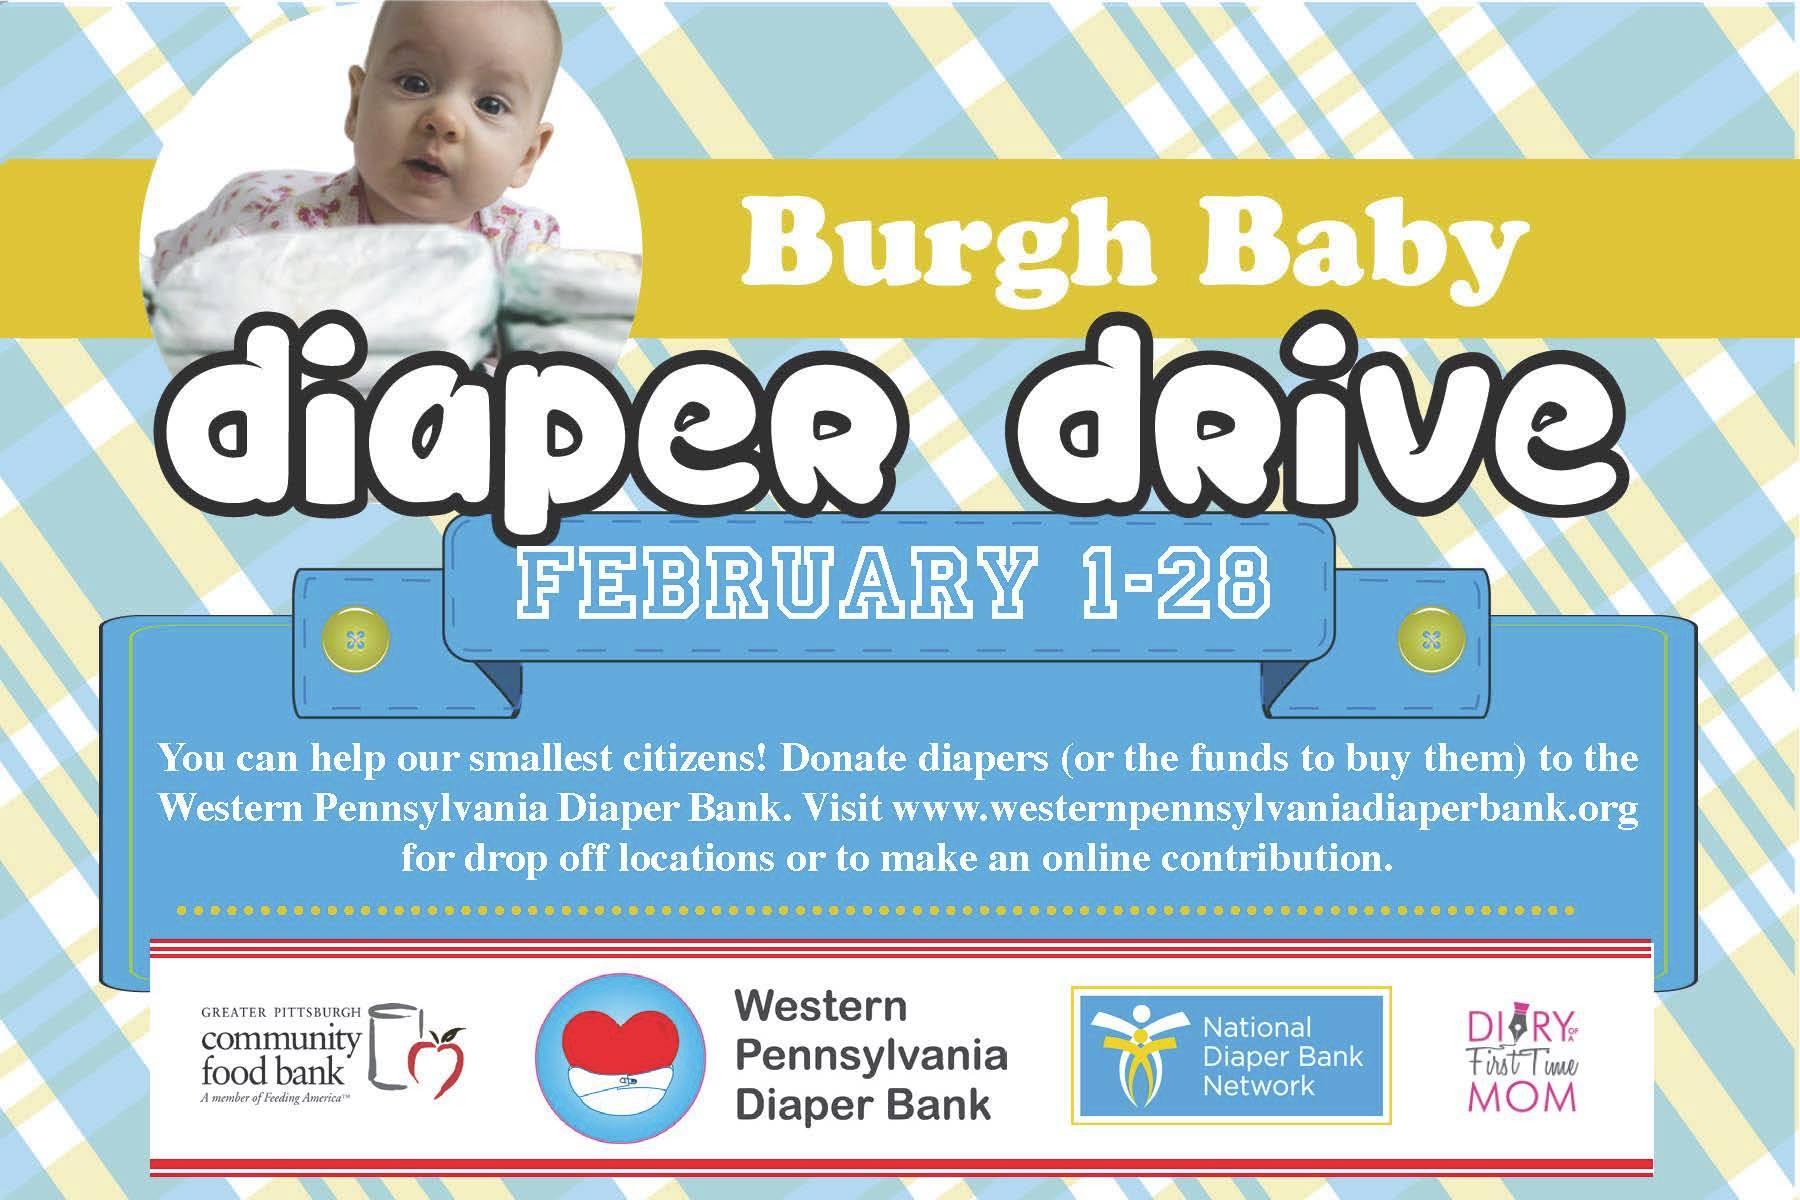 Burgh Baby Diaper Drive